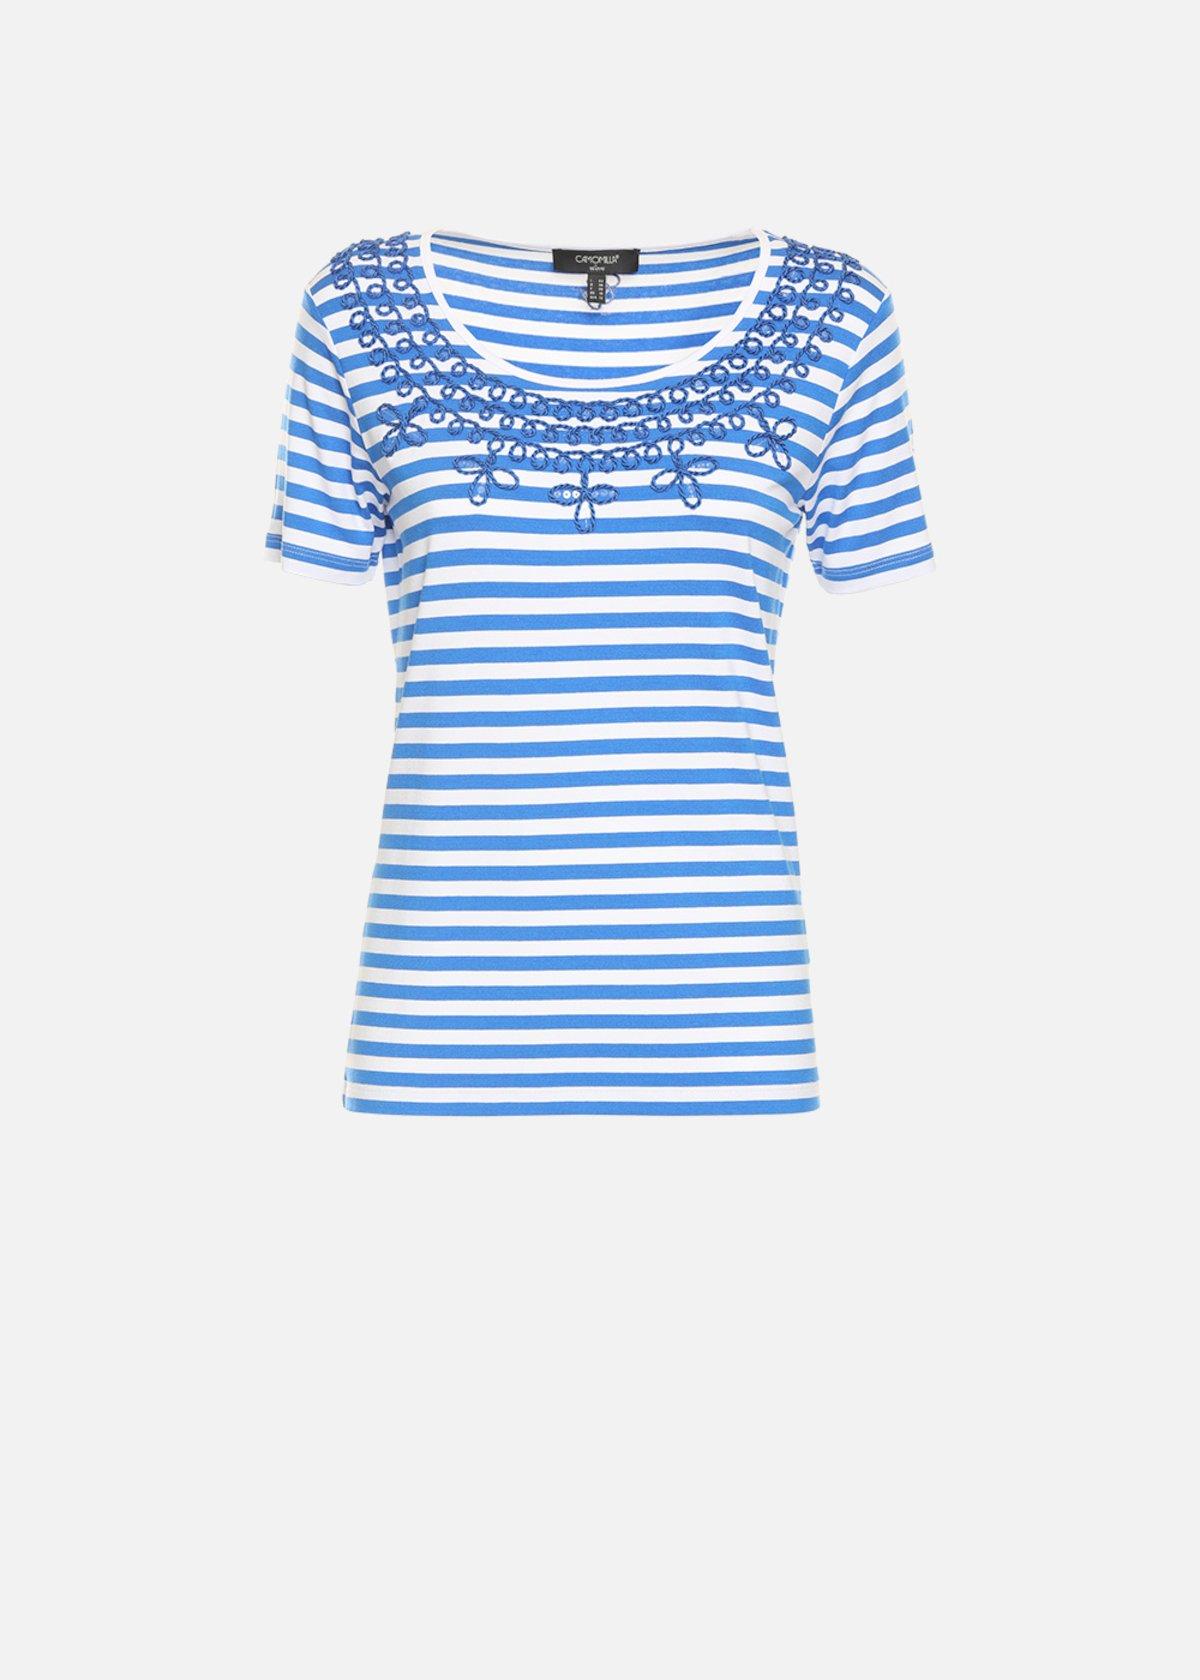 Stuart bicolor t-shirt with rhinestones